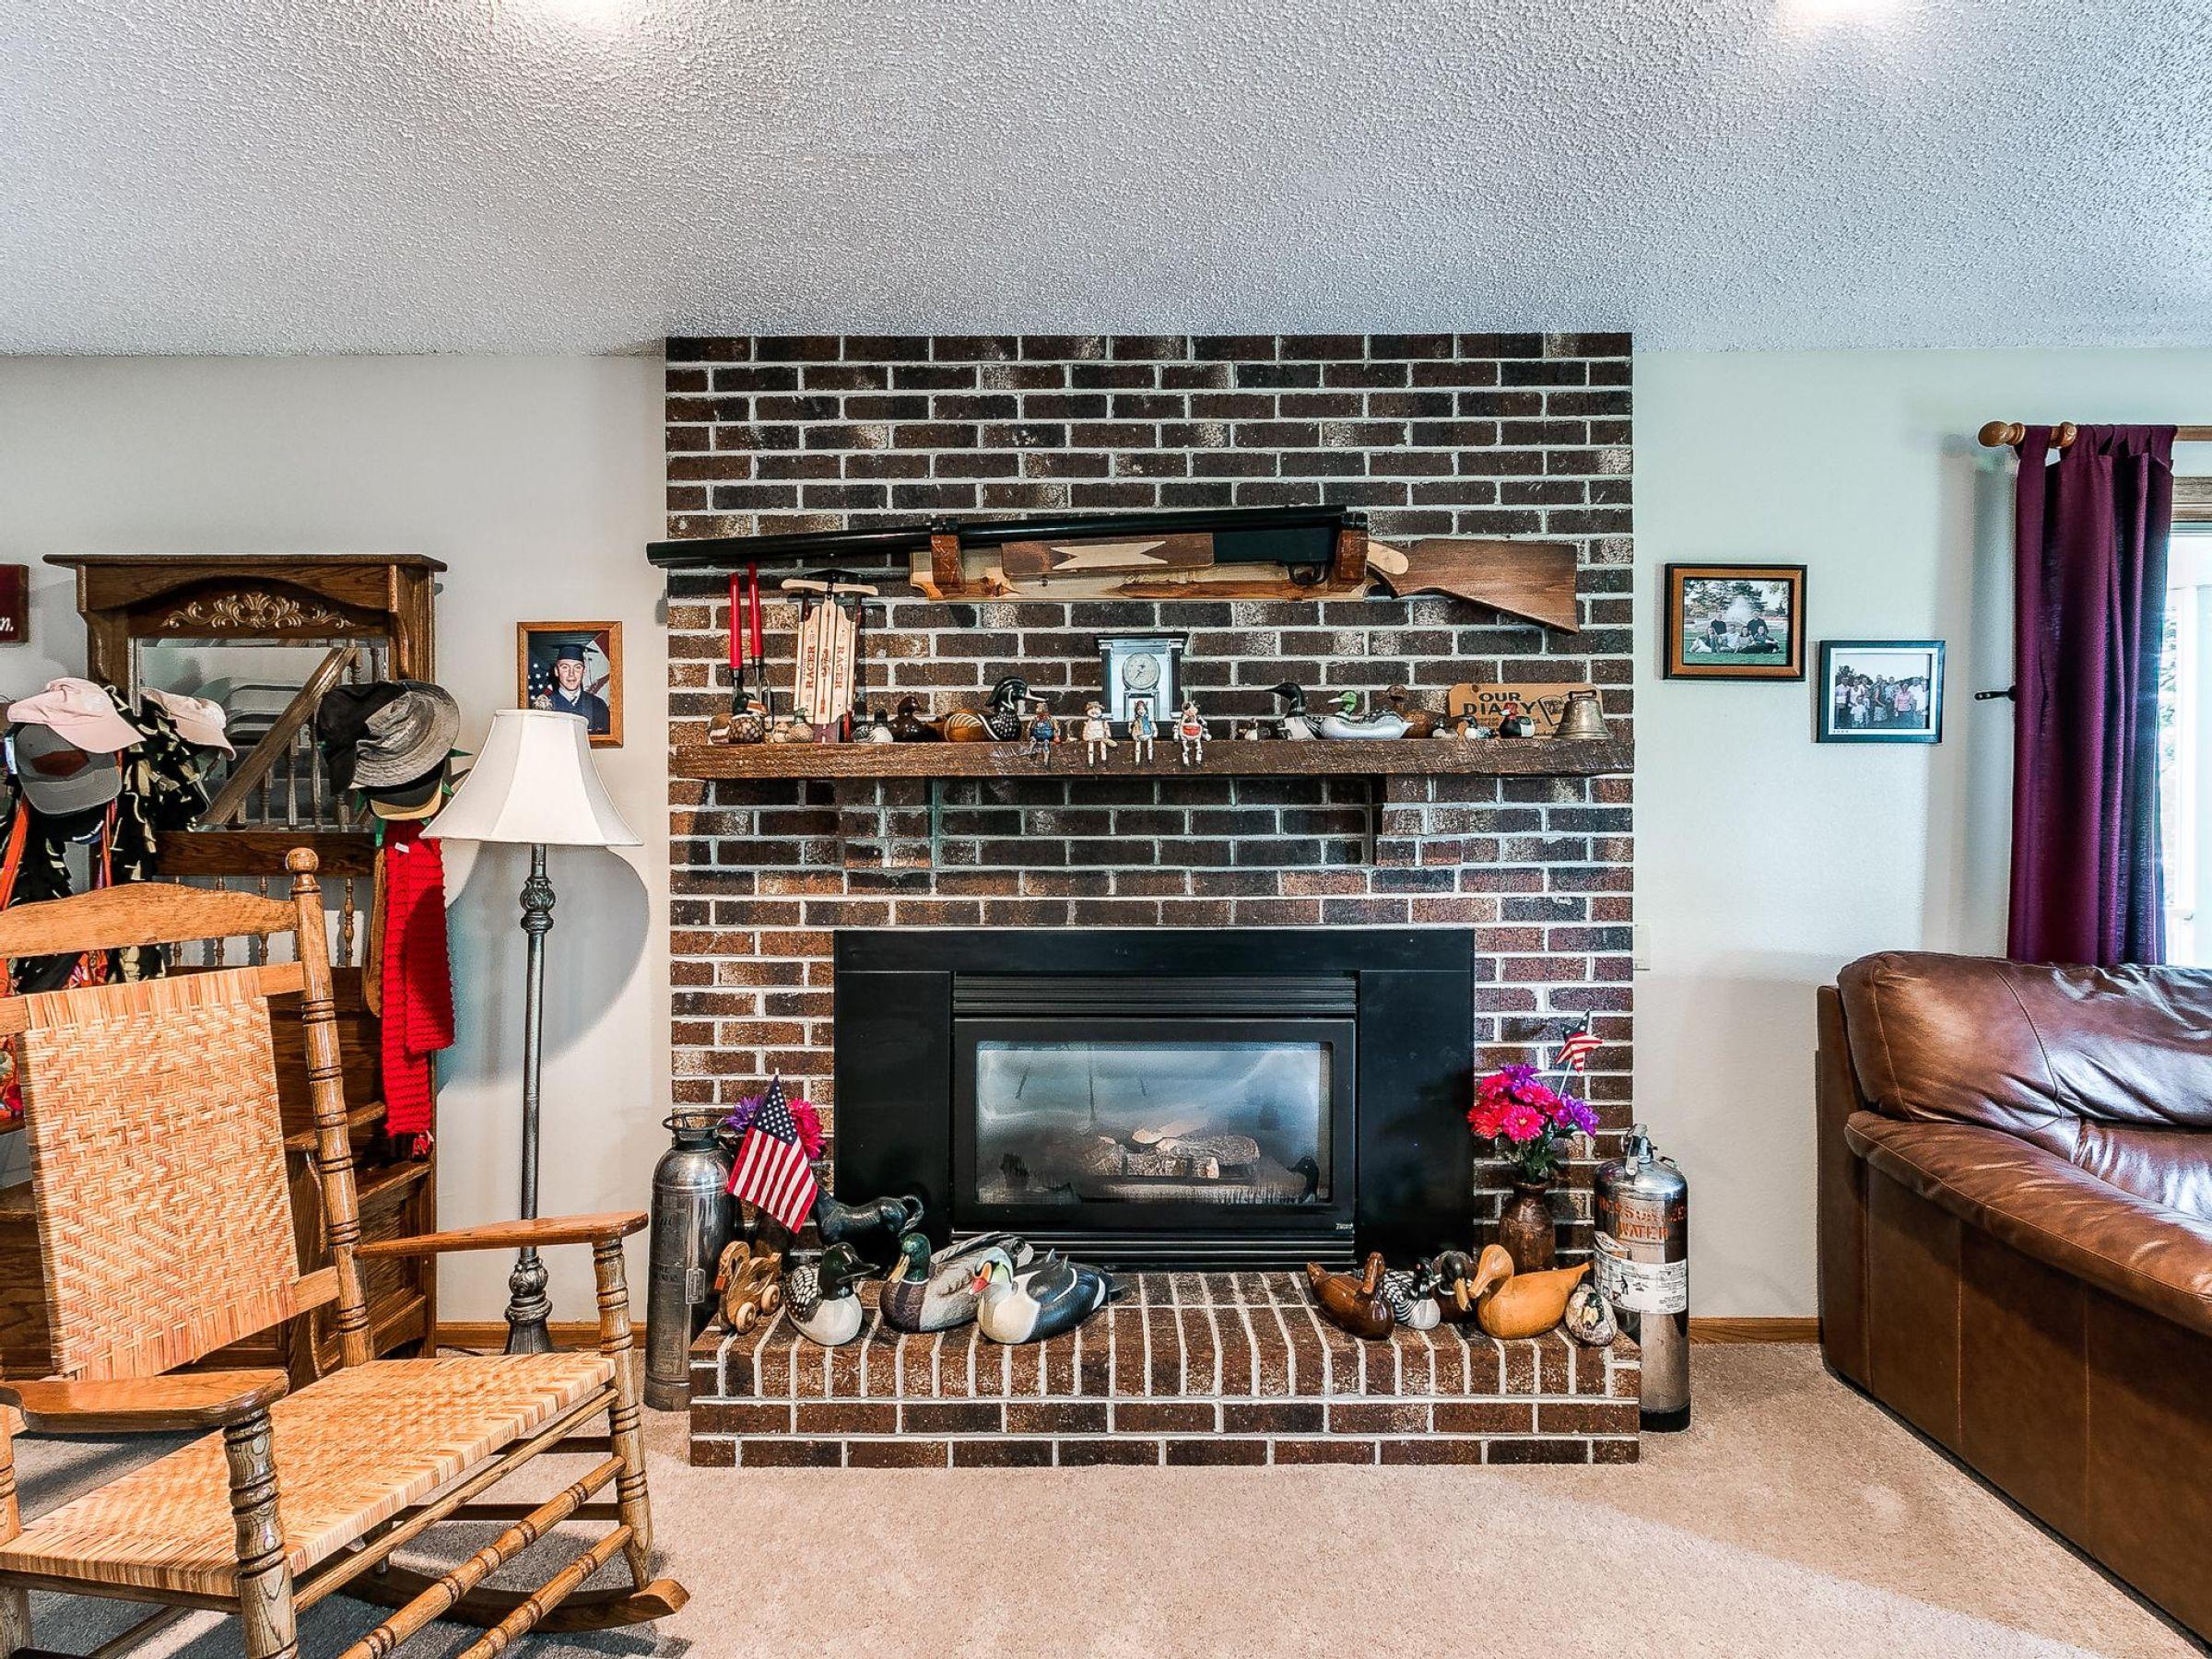 residential-warren-county-iowa-3-acres-listing-number-15593-1-2021-06-18-155610.jpg